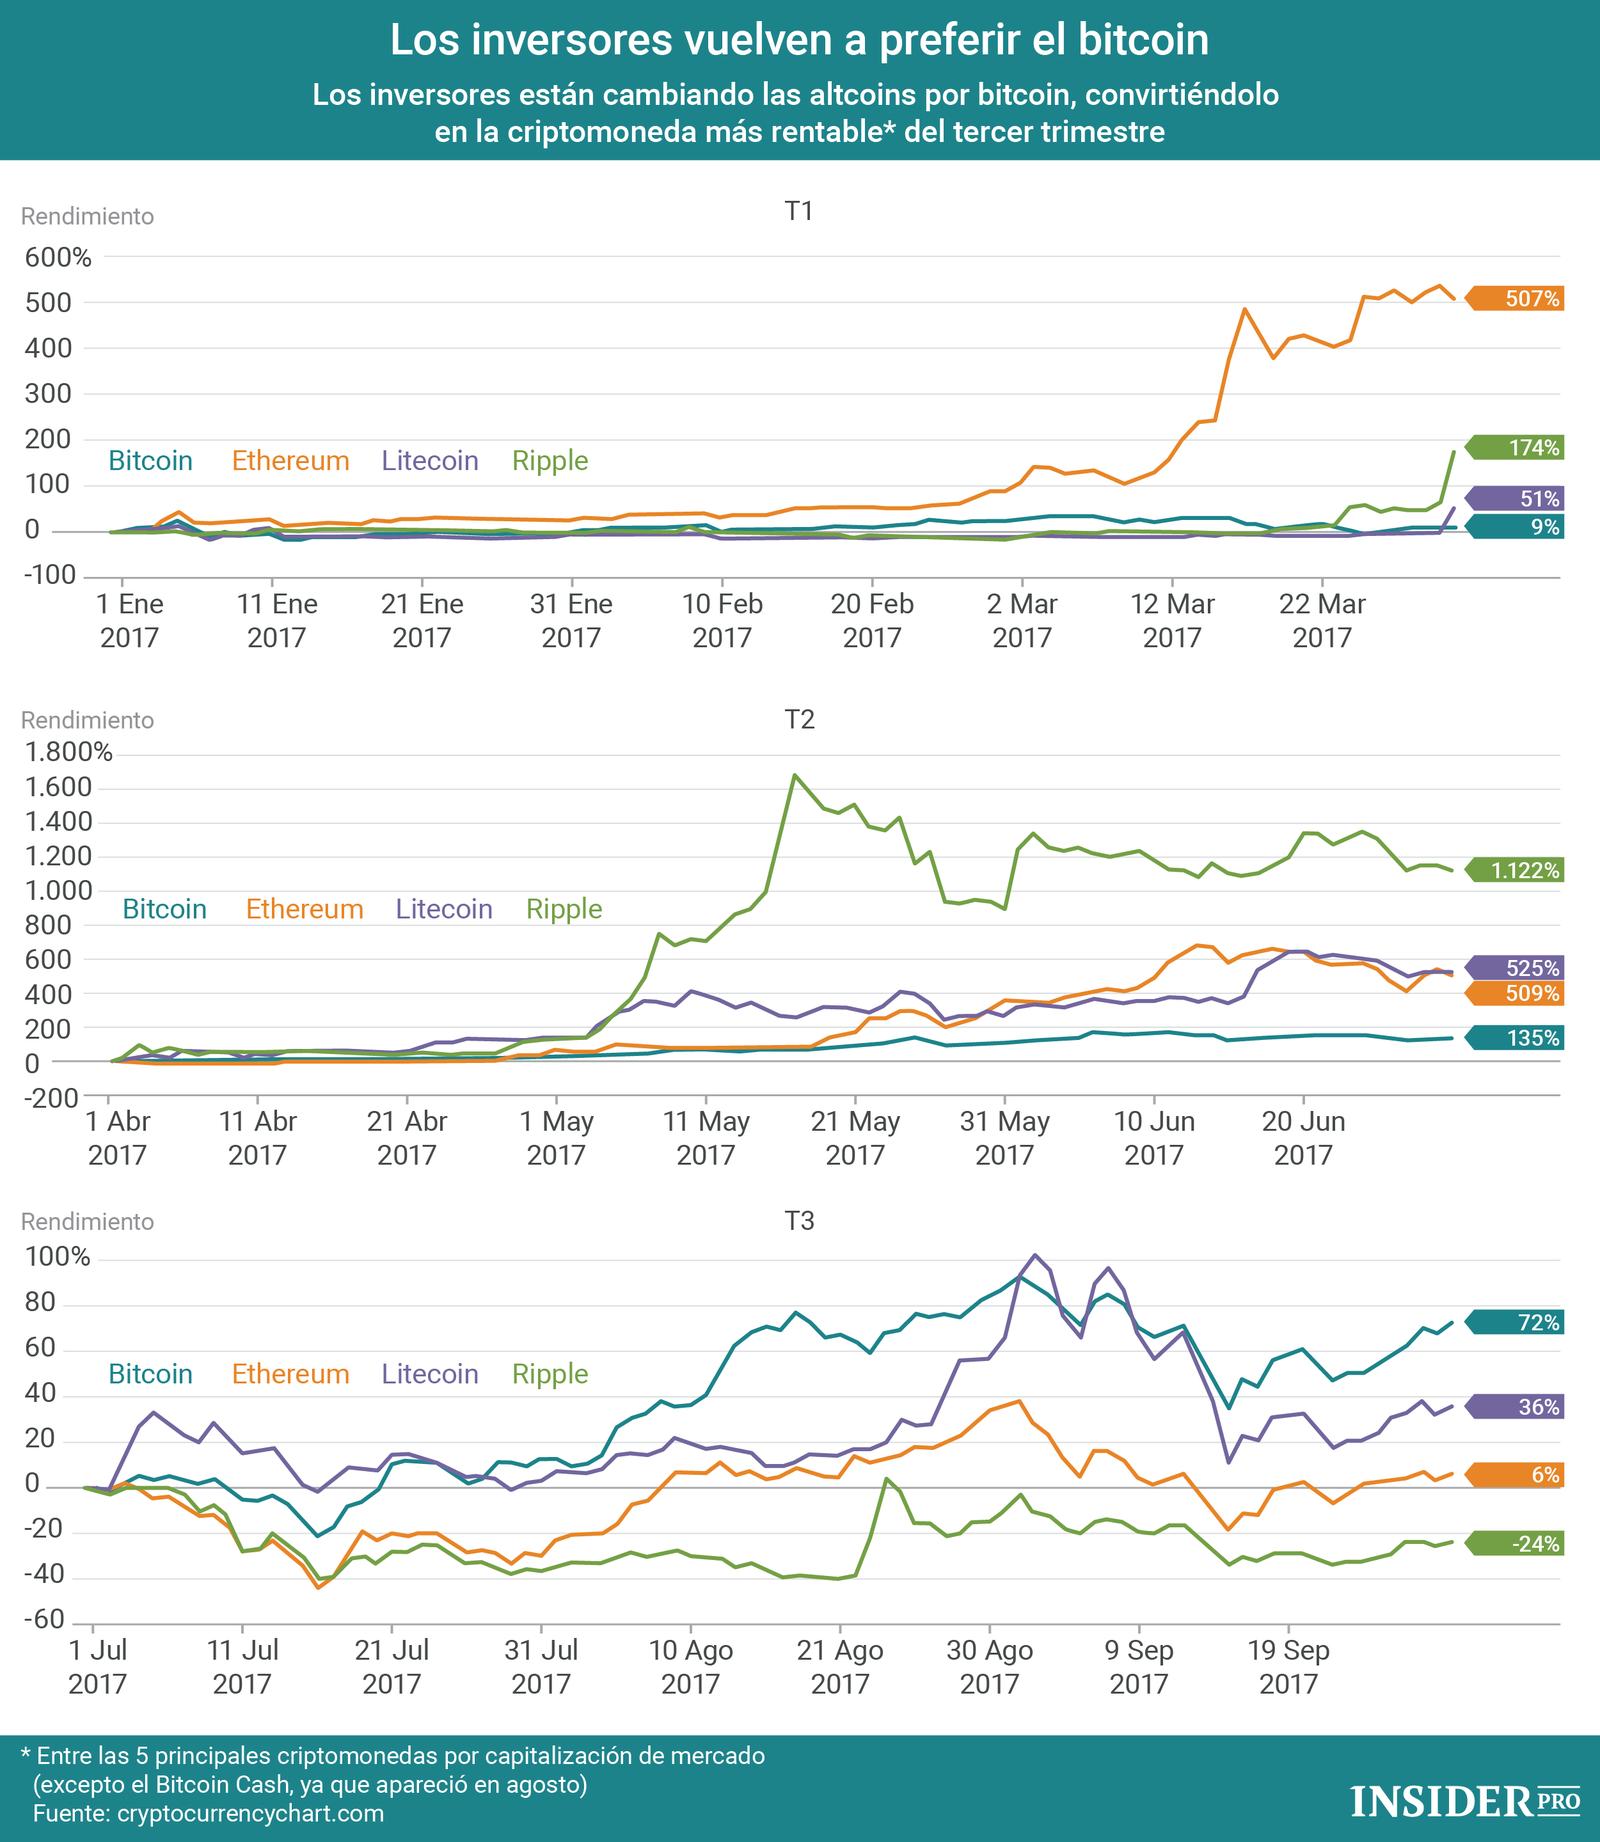 Las criptomonedas m s rentables infografia infographic - Calefaccion mas rentable ...